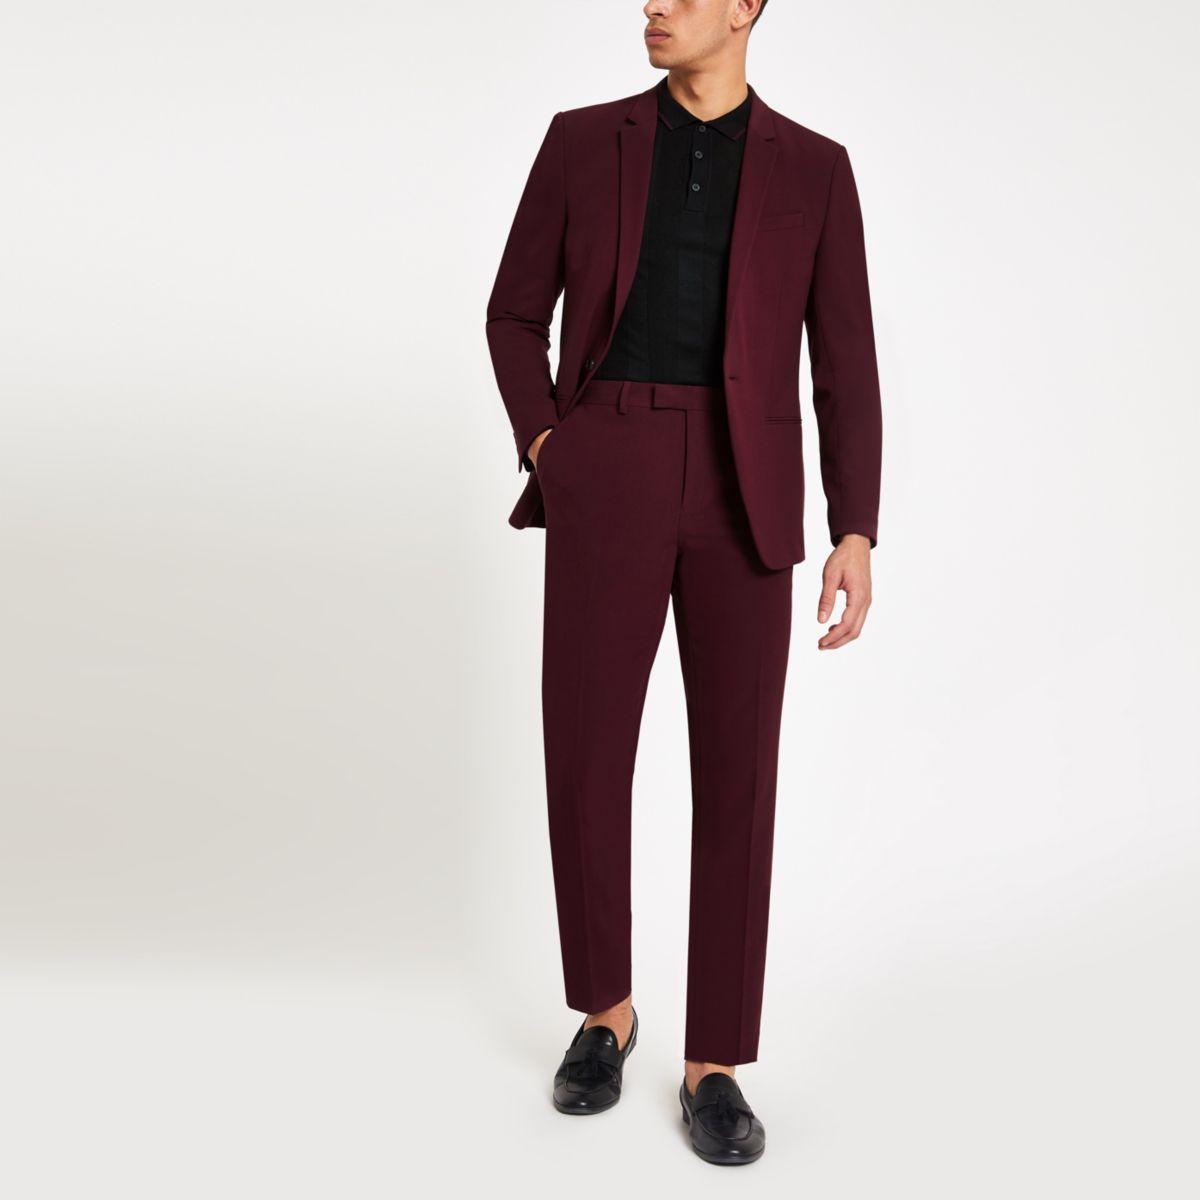 Burgundy skinny fit suit pants